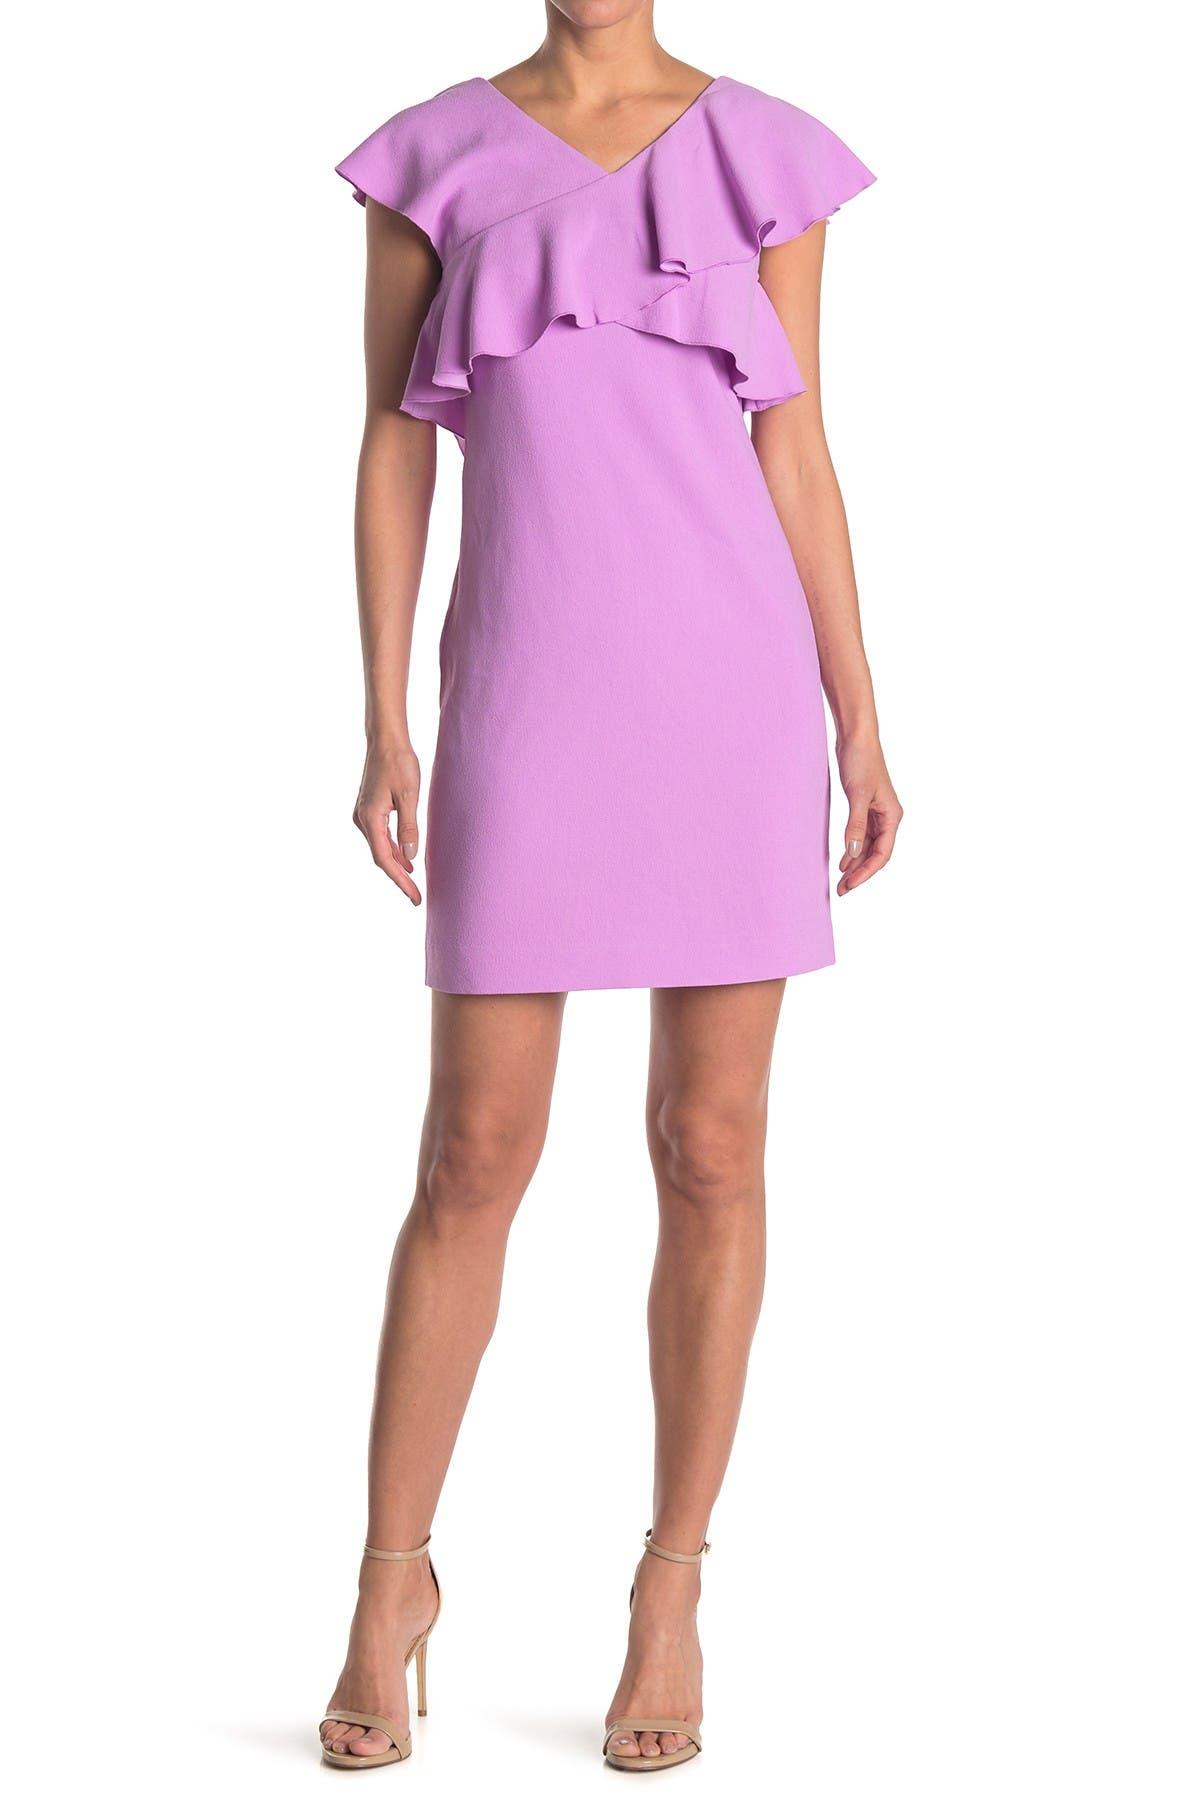 Image of Trina Turk Cameron Dress